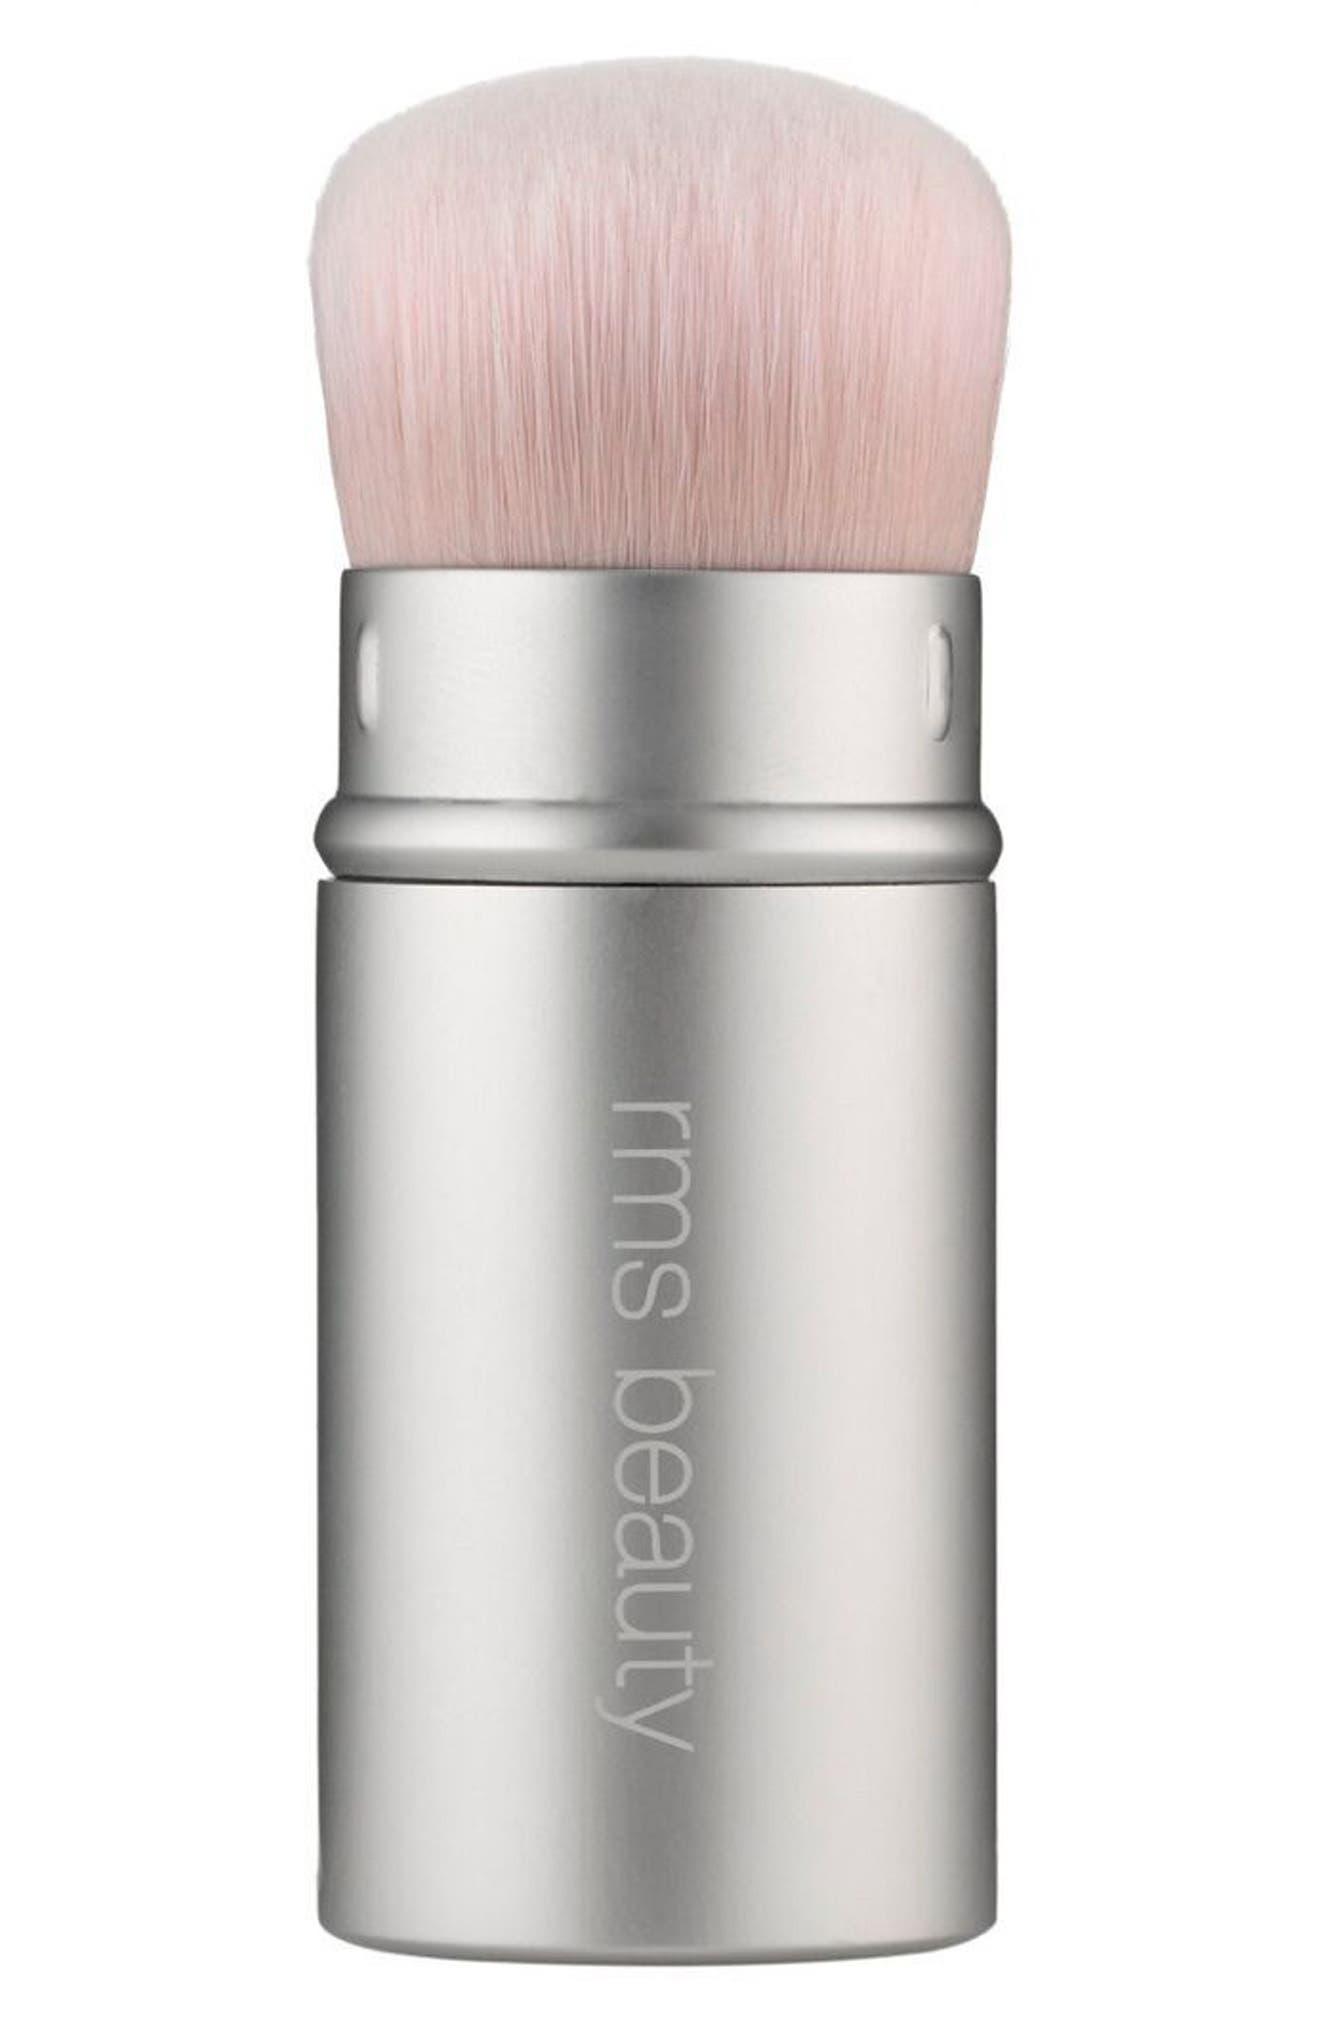 RMS Beauty Kabuki Polisher Retractable Brush